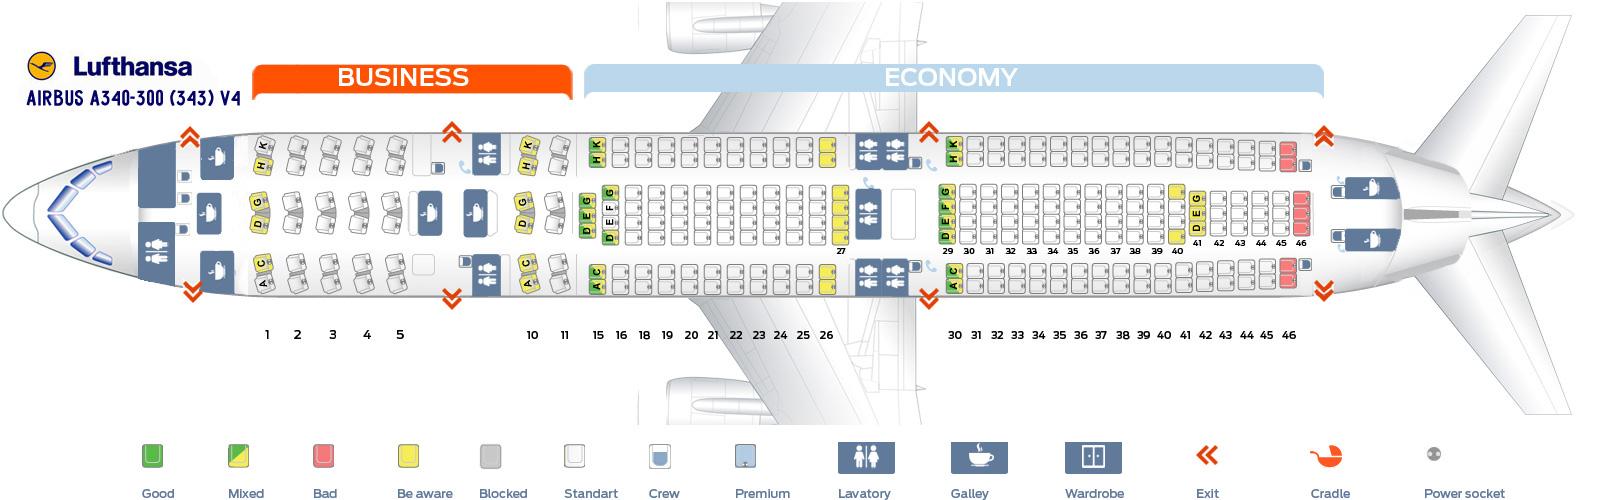 Seat_map_Lufthansa_Airbus_A340-300_v4